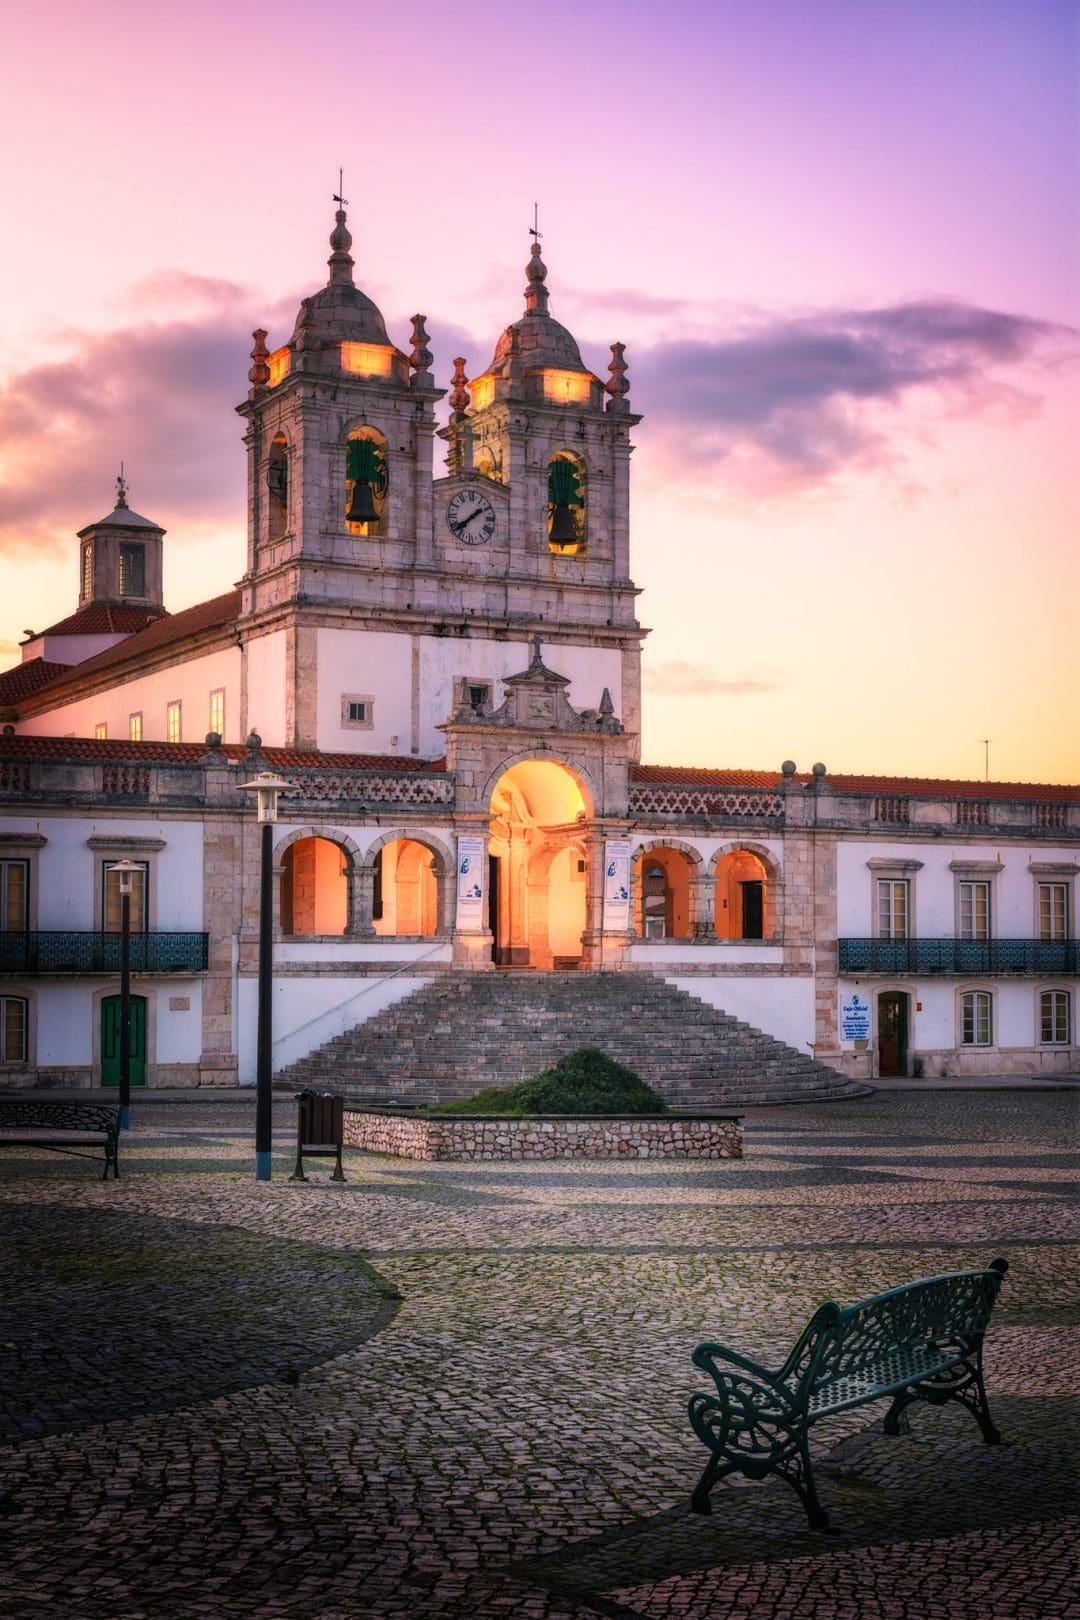 Church of Nossa Senhora da Nazaré. Nazare during sunset, Portugal